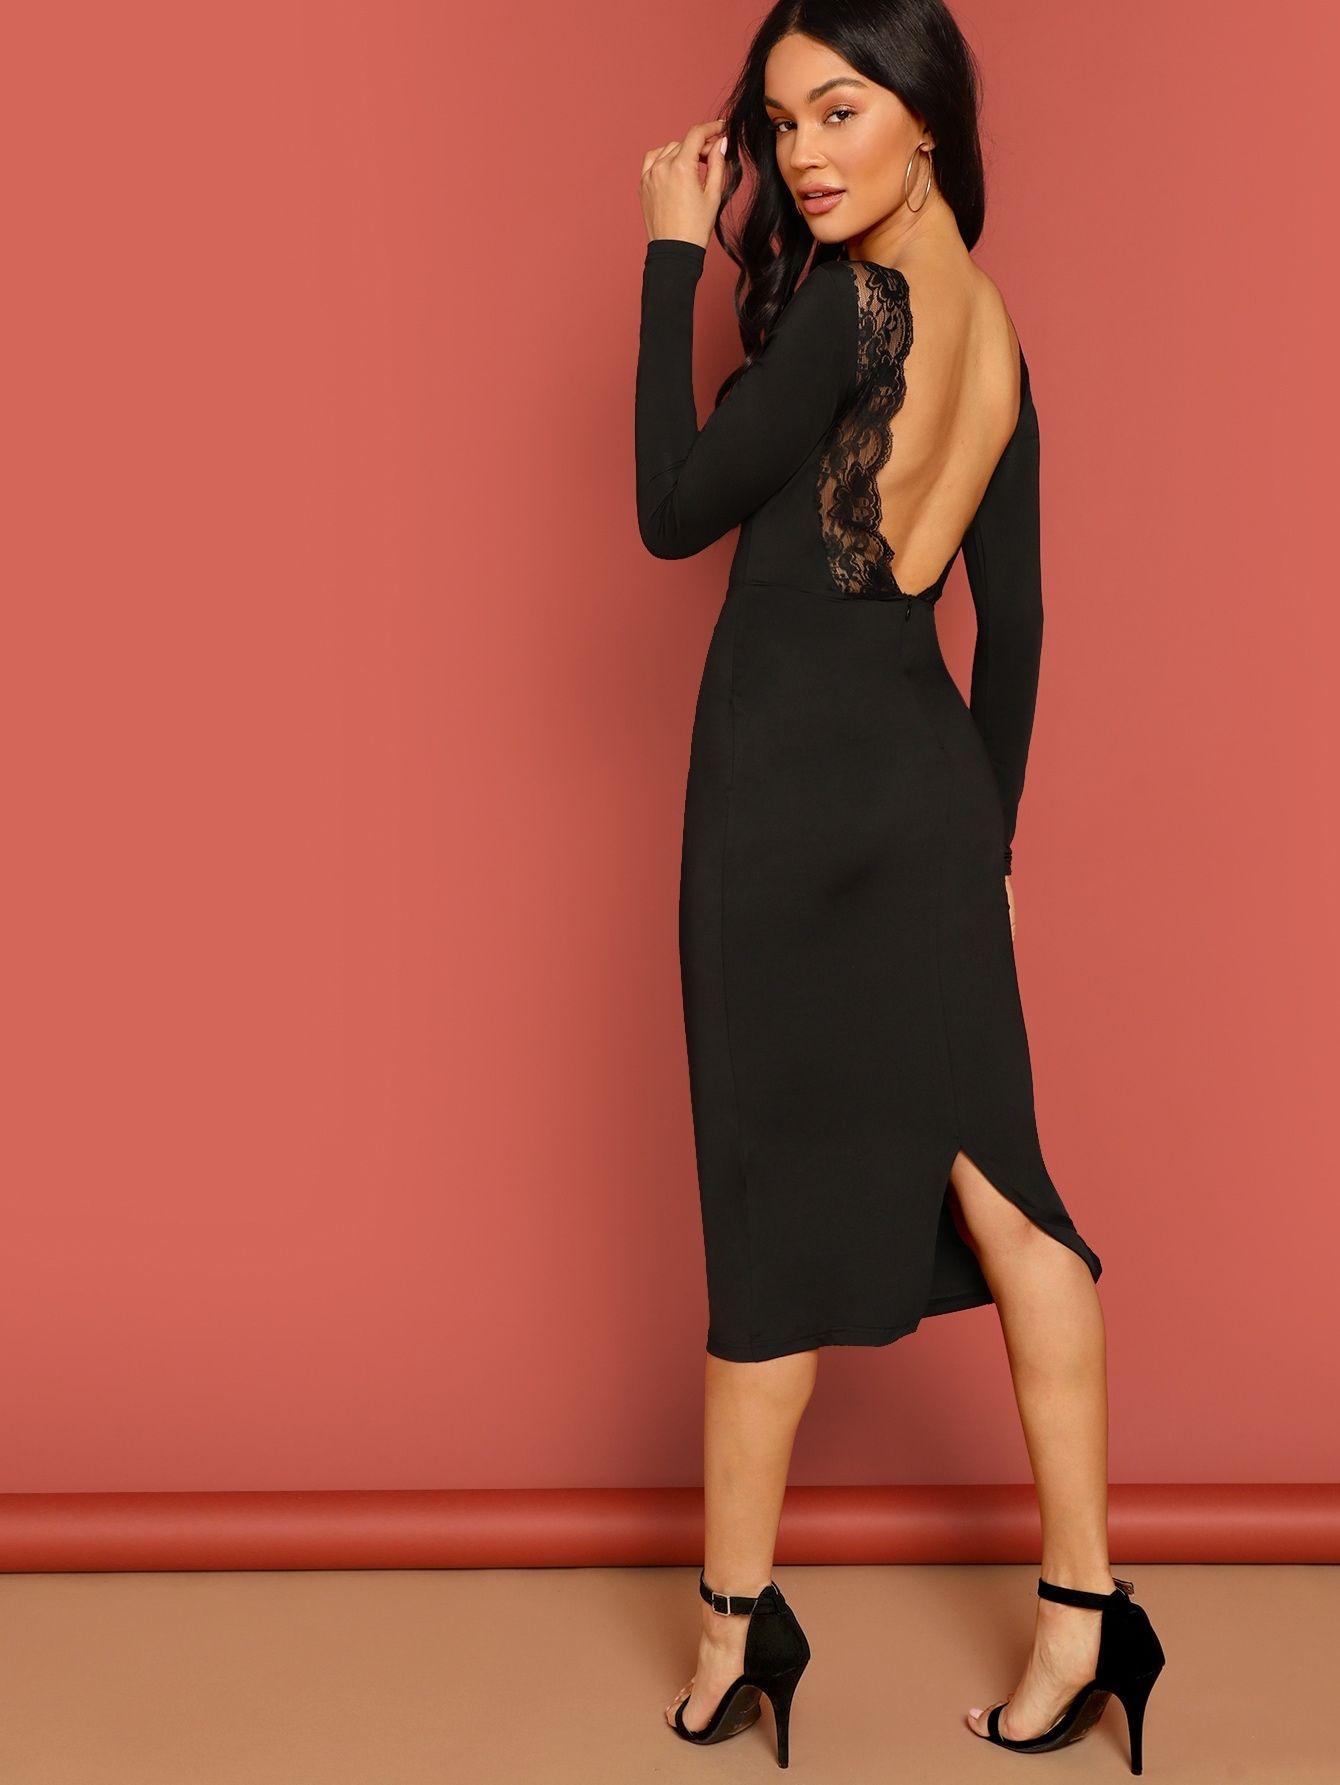 Lace Trim Backless Split Bodycon Dress Shein Usa In 2021 Bodycon Dress Dresses Fashion [ 1785 x 1340 Pixel ]